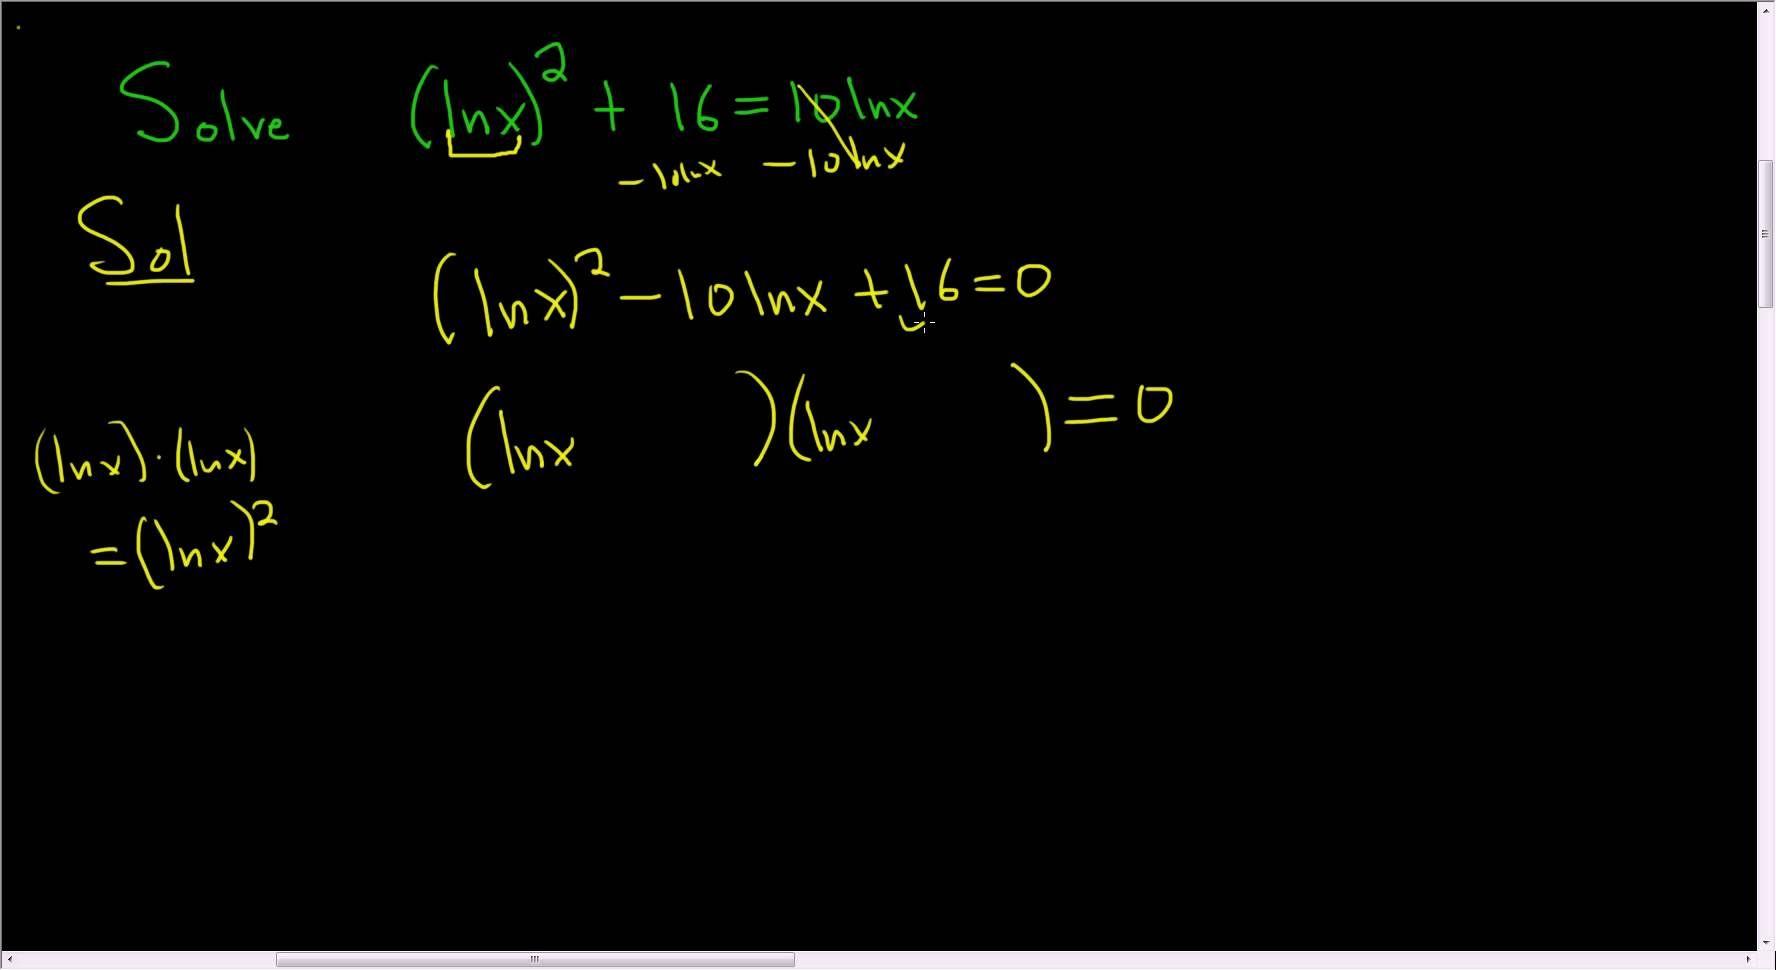 Solving The Logarithmic Equation Lnx 2 16 10 Lnx Quadratics Math Videos Quadratic Equation